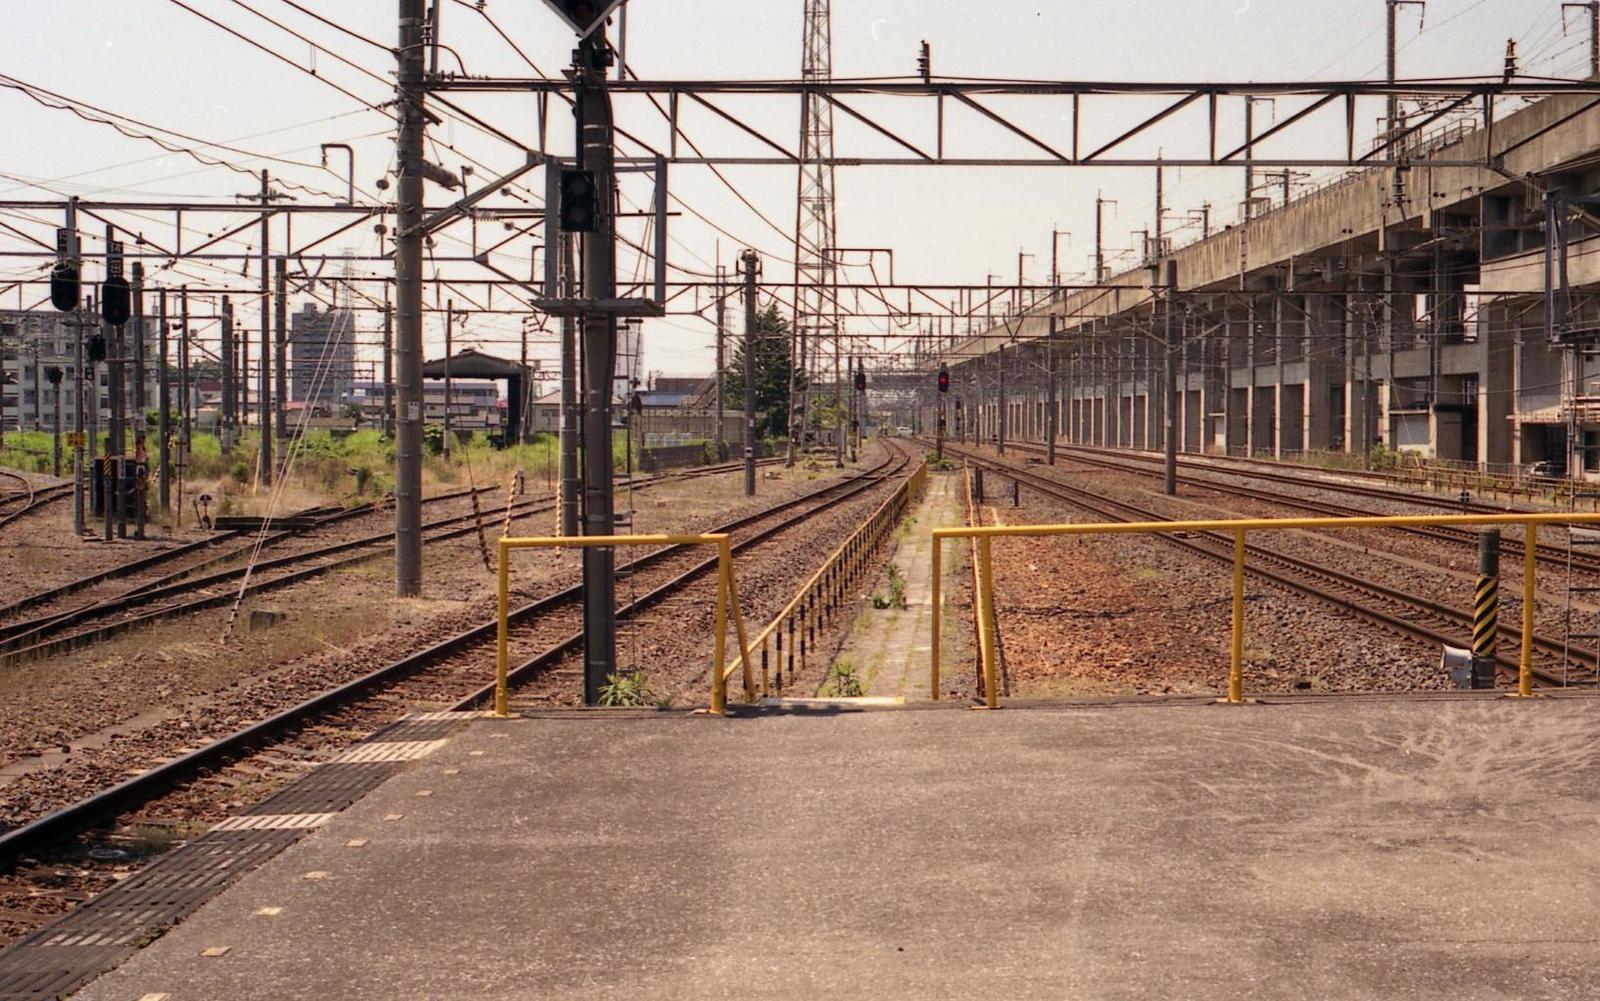 20020526a58